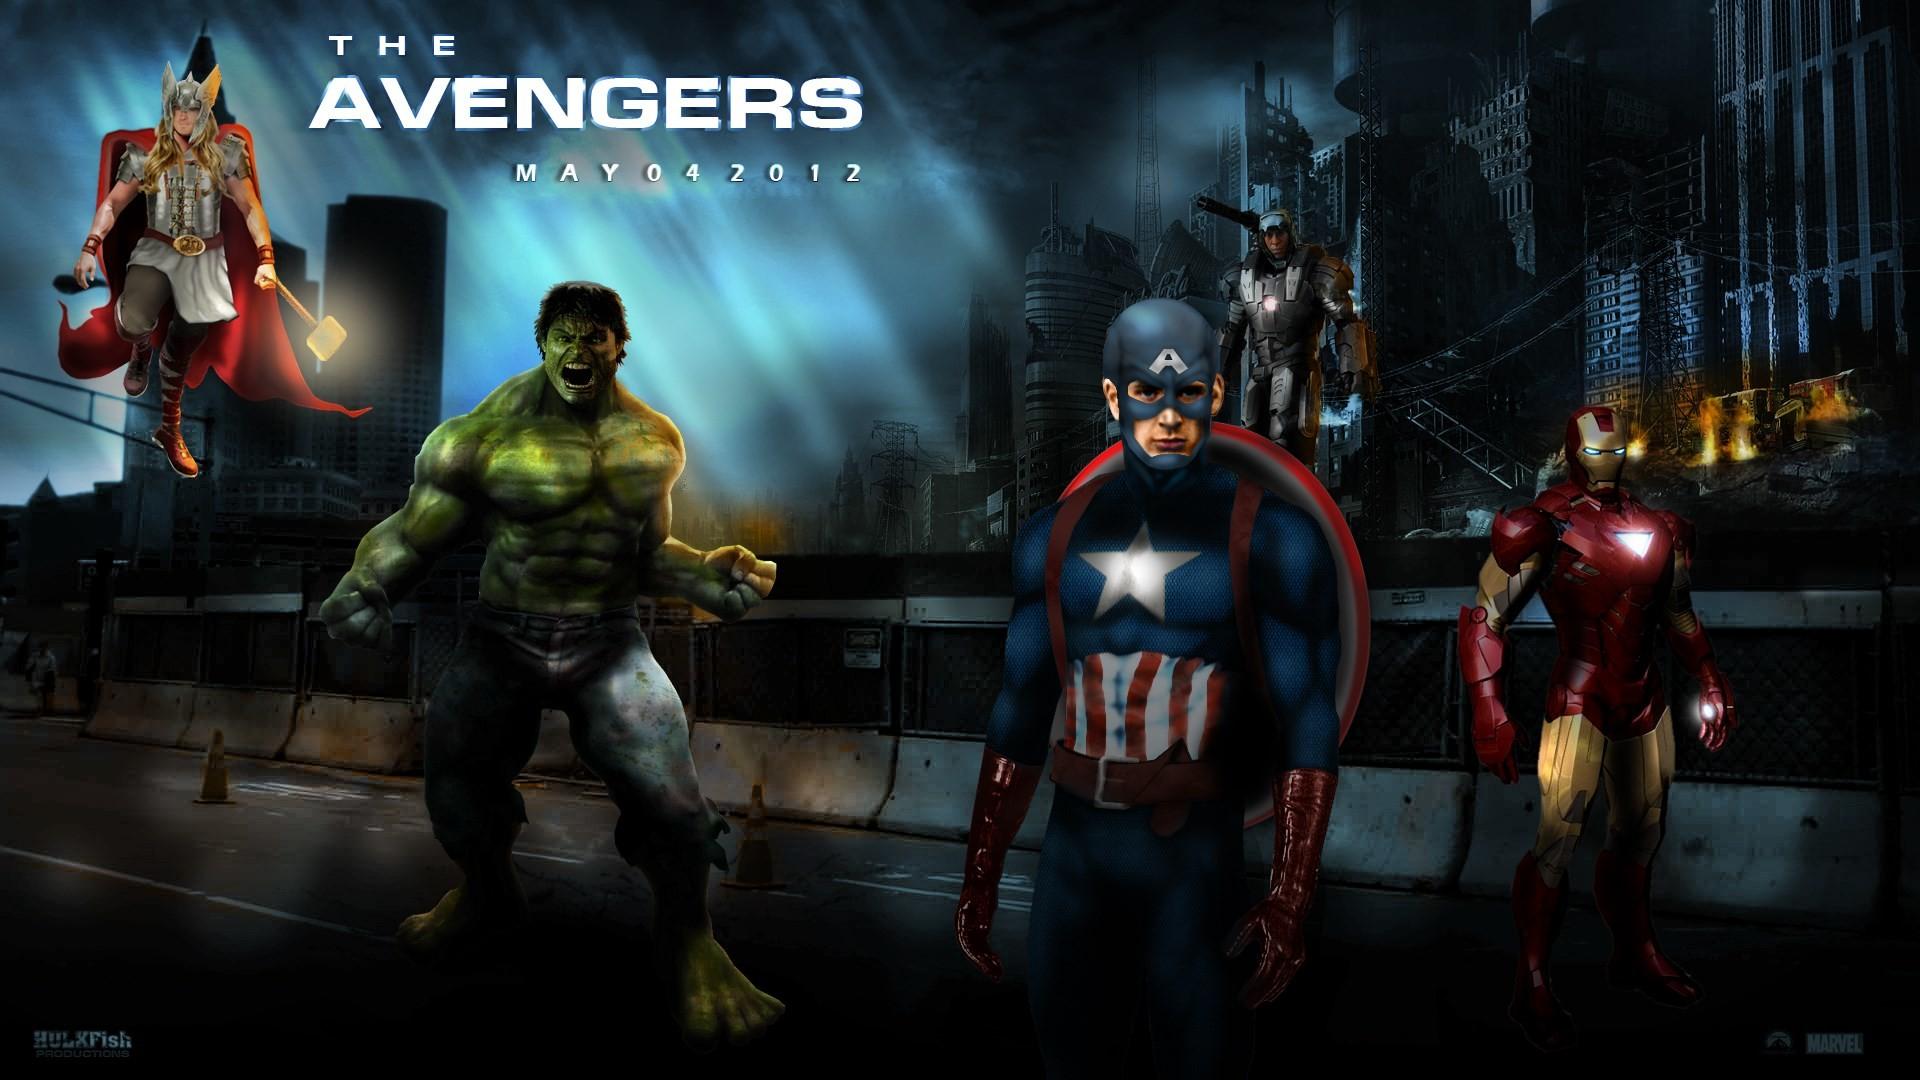 Avengers Desktop Wallpaper 75 images